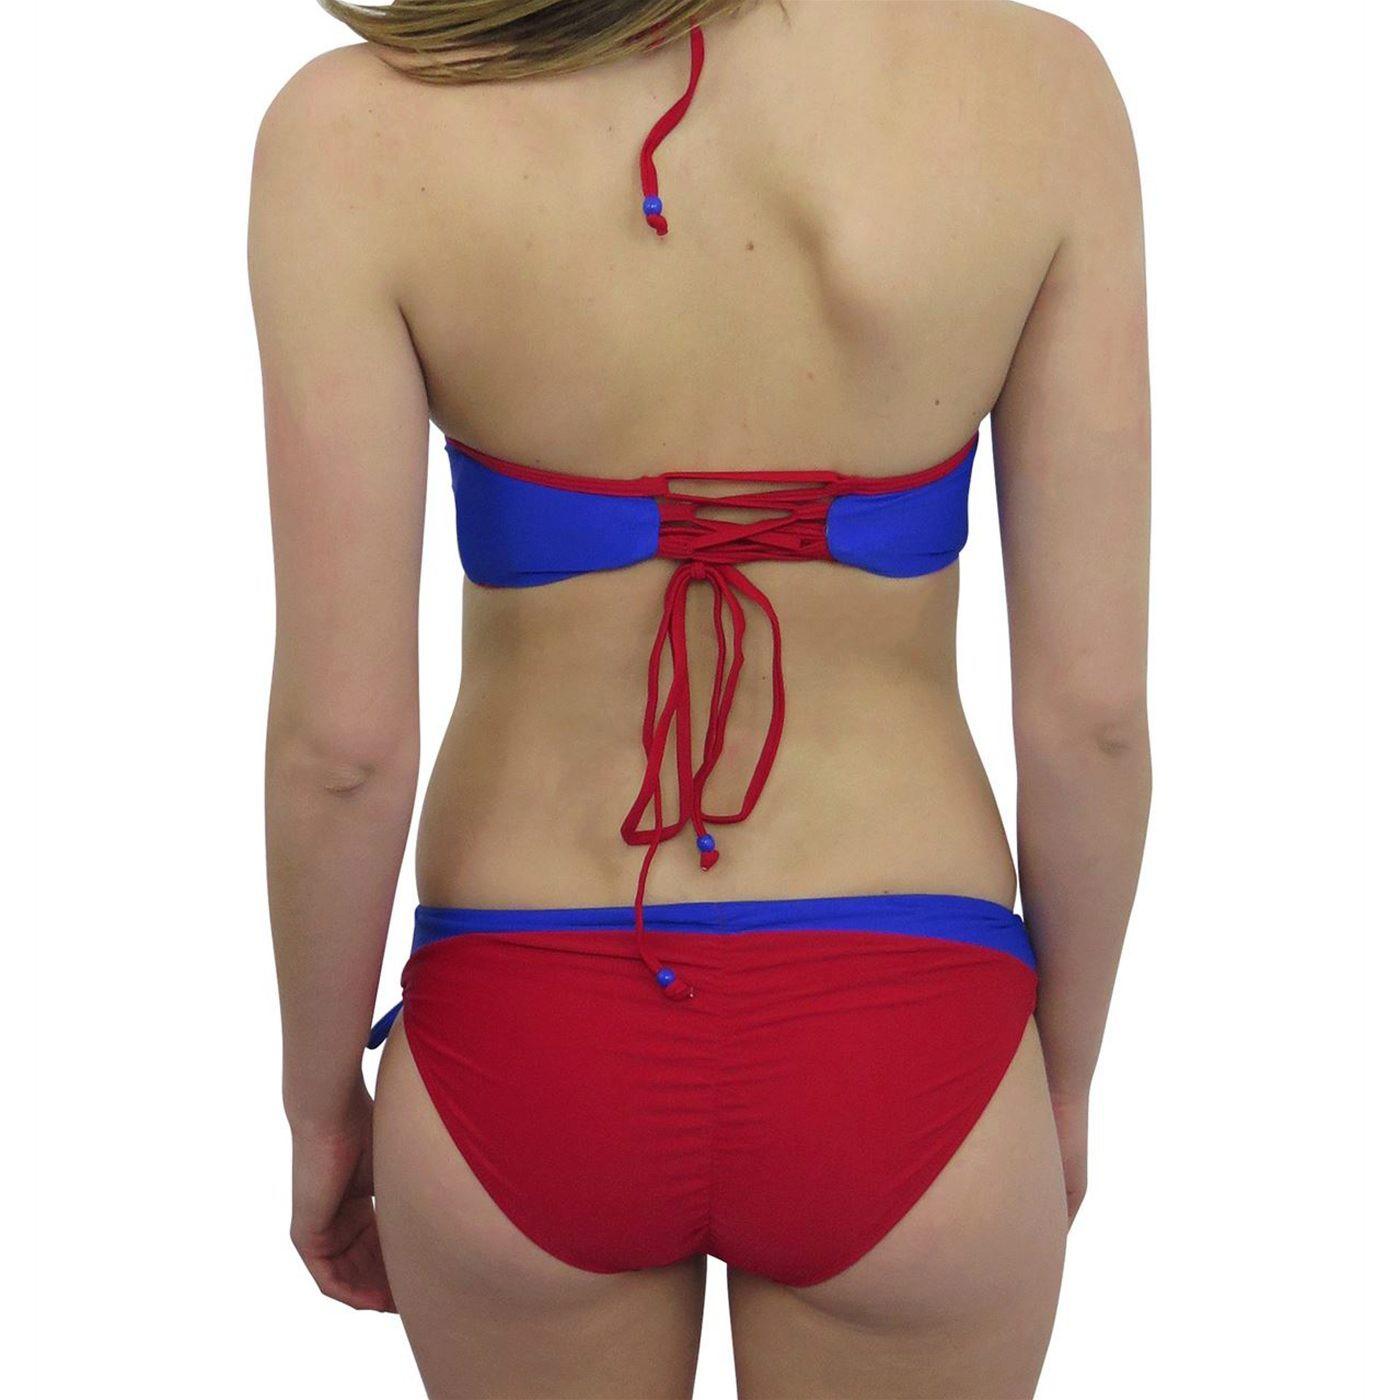 Supergirl Lace-Up Bustier Bikini